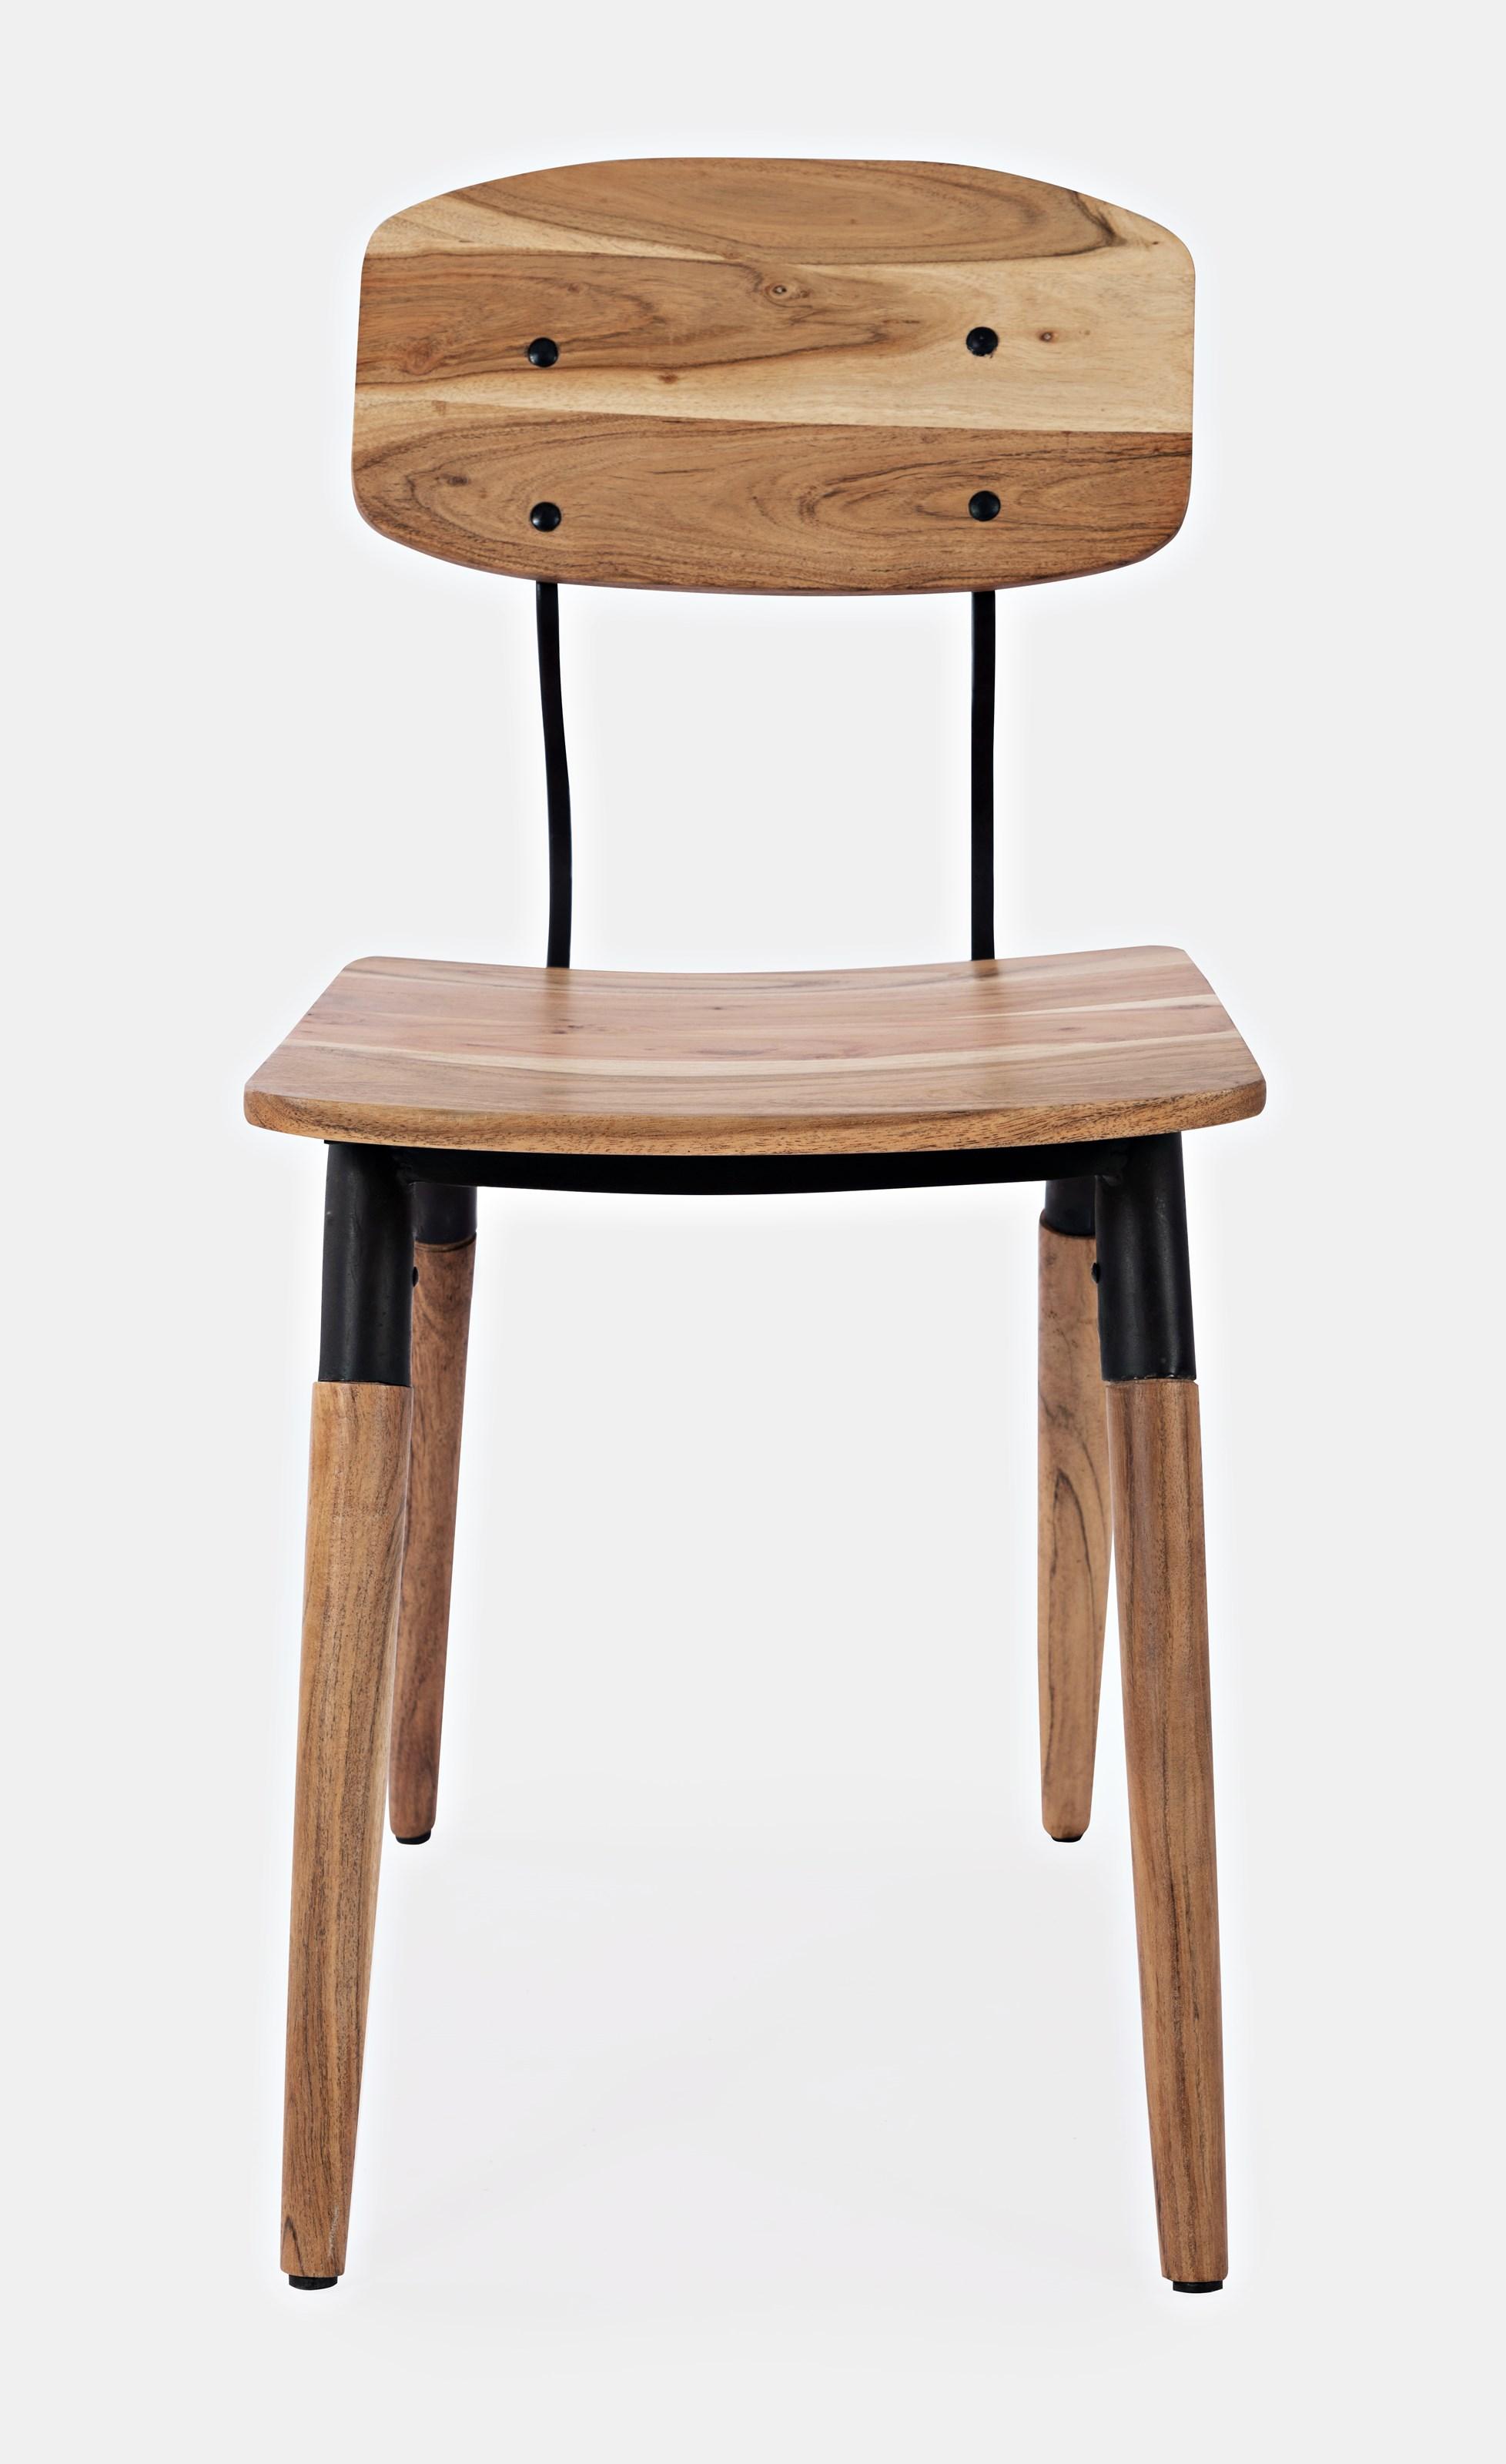 Nature's Edge Dining Chair by Jofran at Jofran